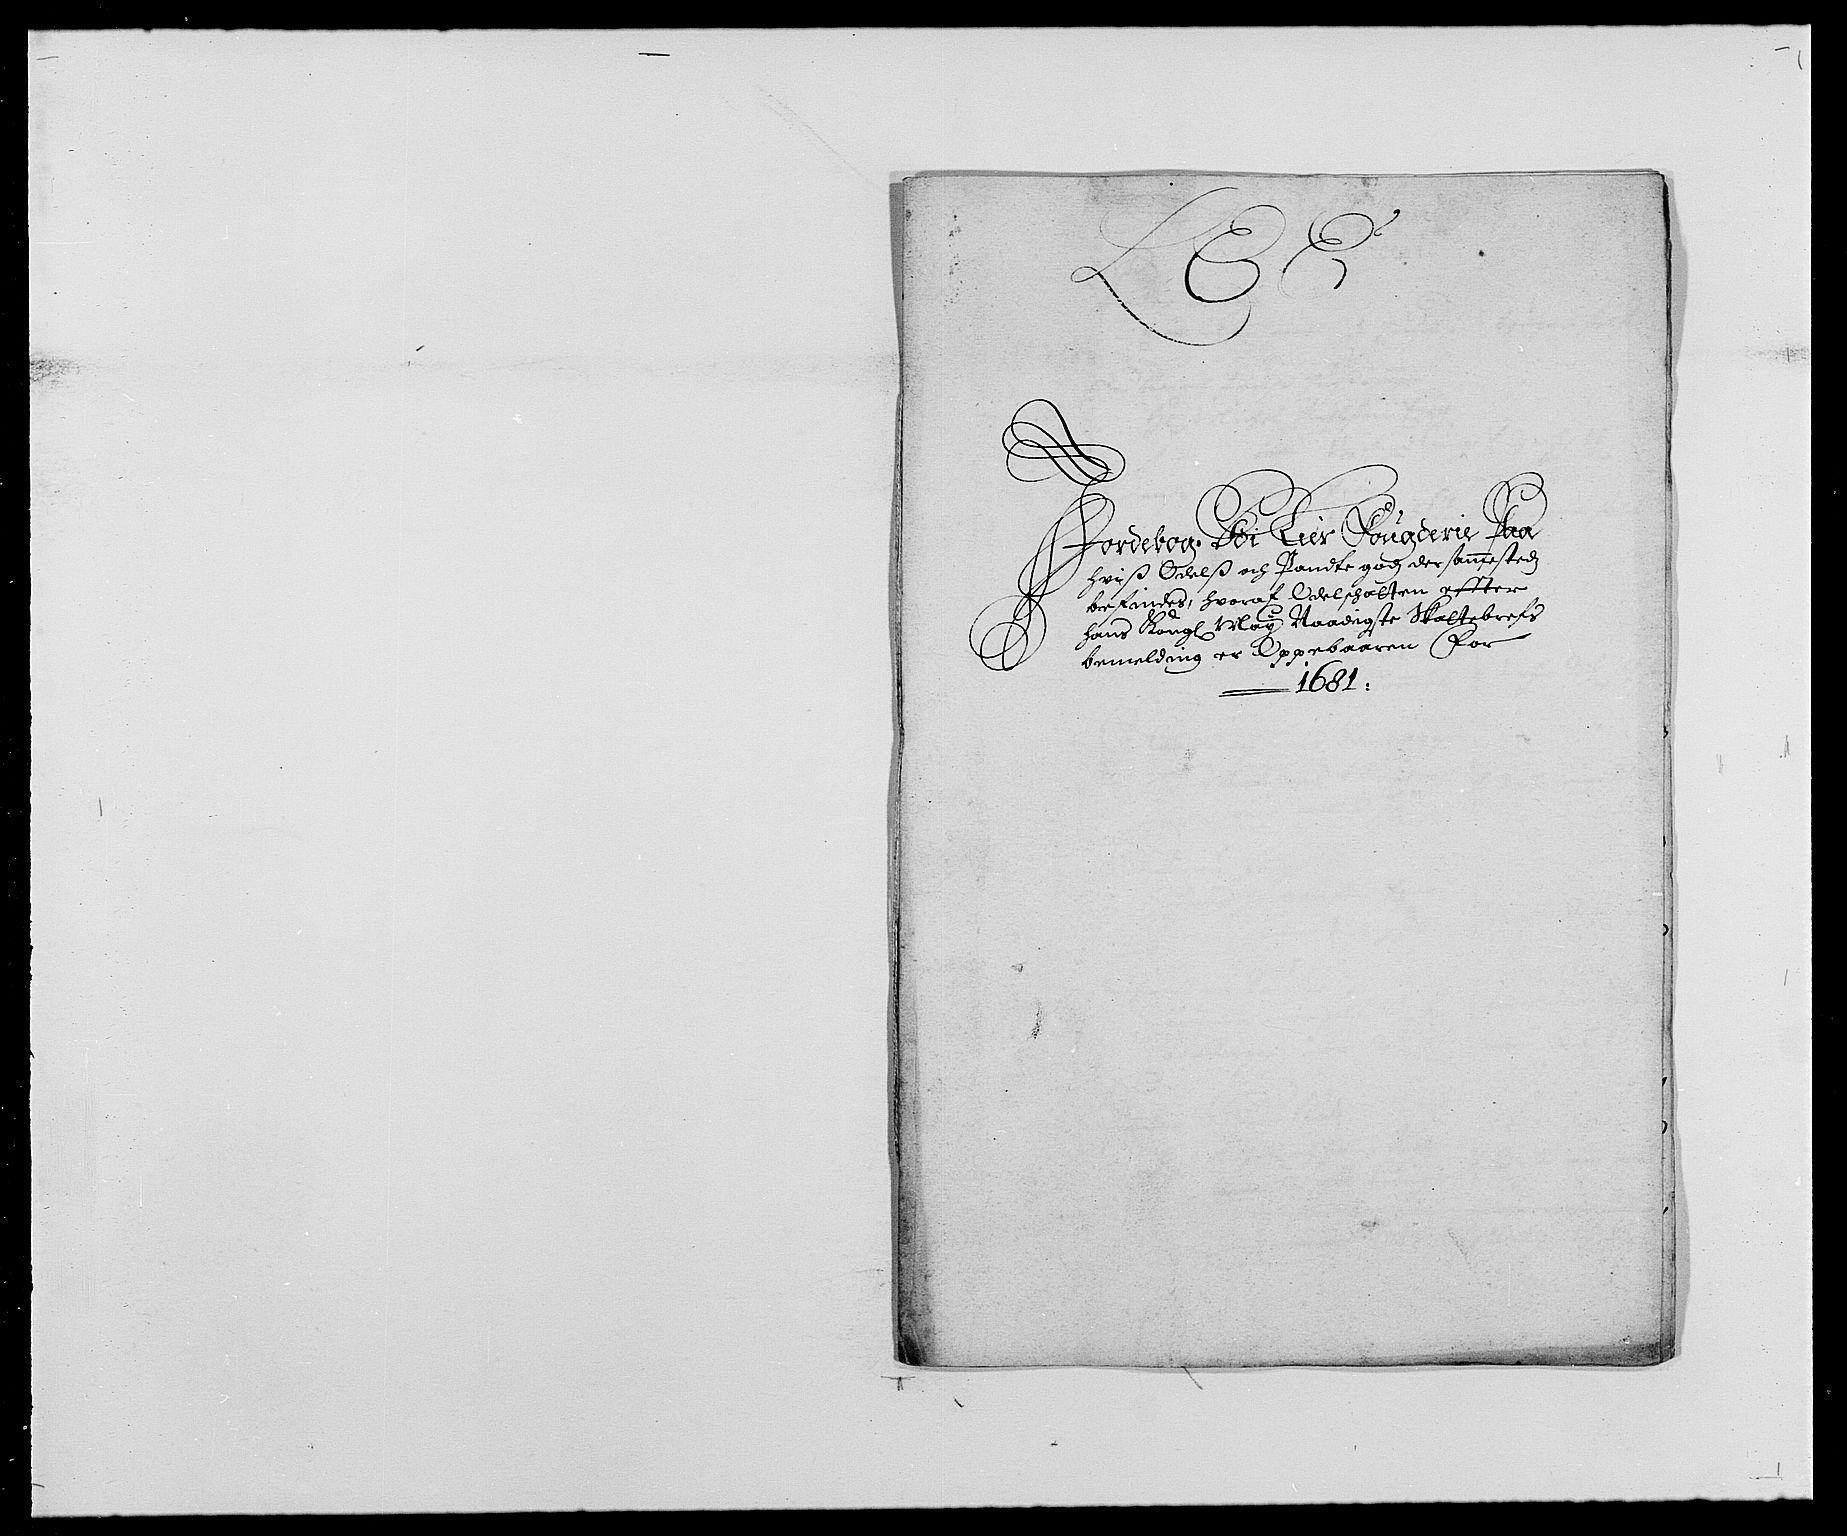 RA, Rentekammeret inntil 1814, Reviderte regnskaper, Fogderegnskap, R27/L1686: Fogderegnskap Lier, 1678-1686, s. 344